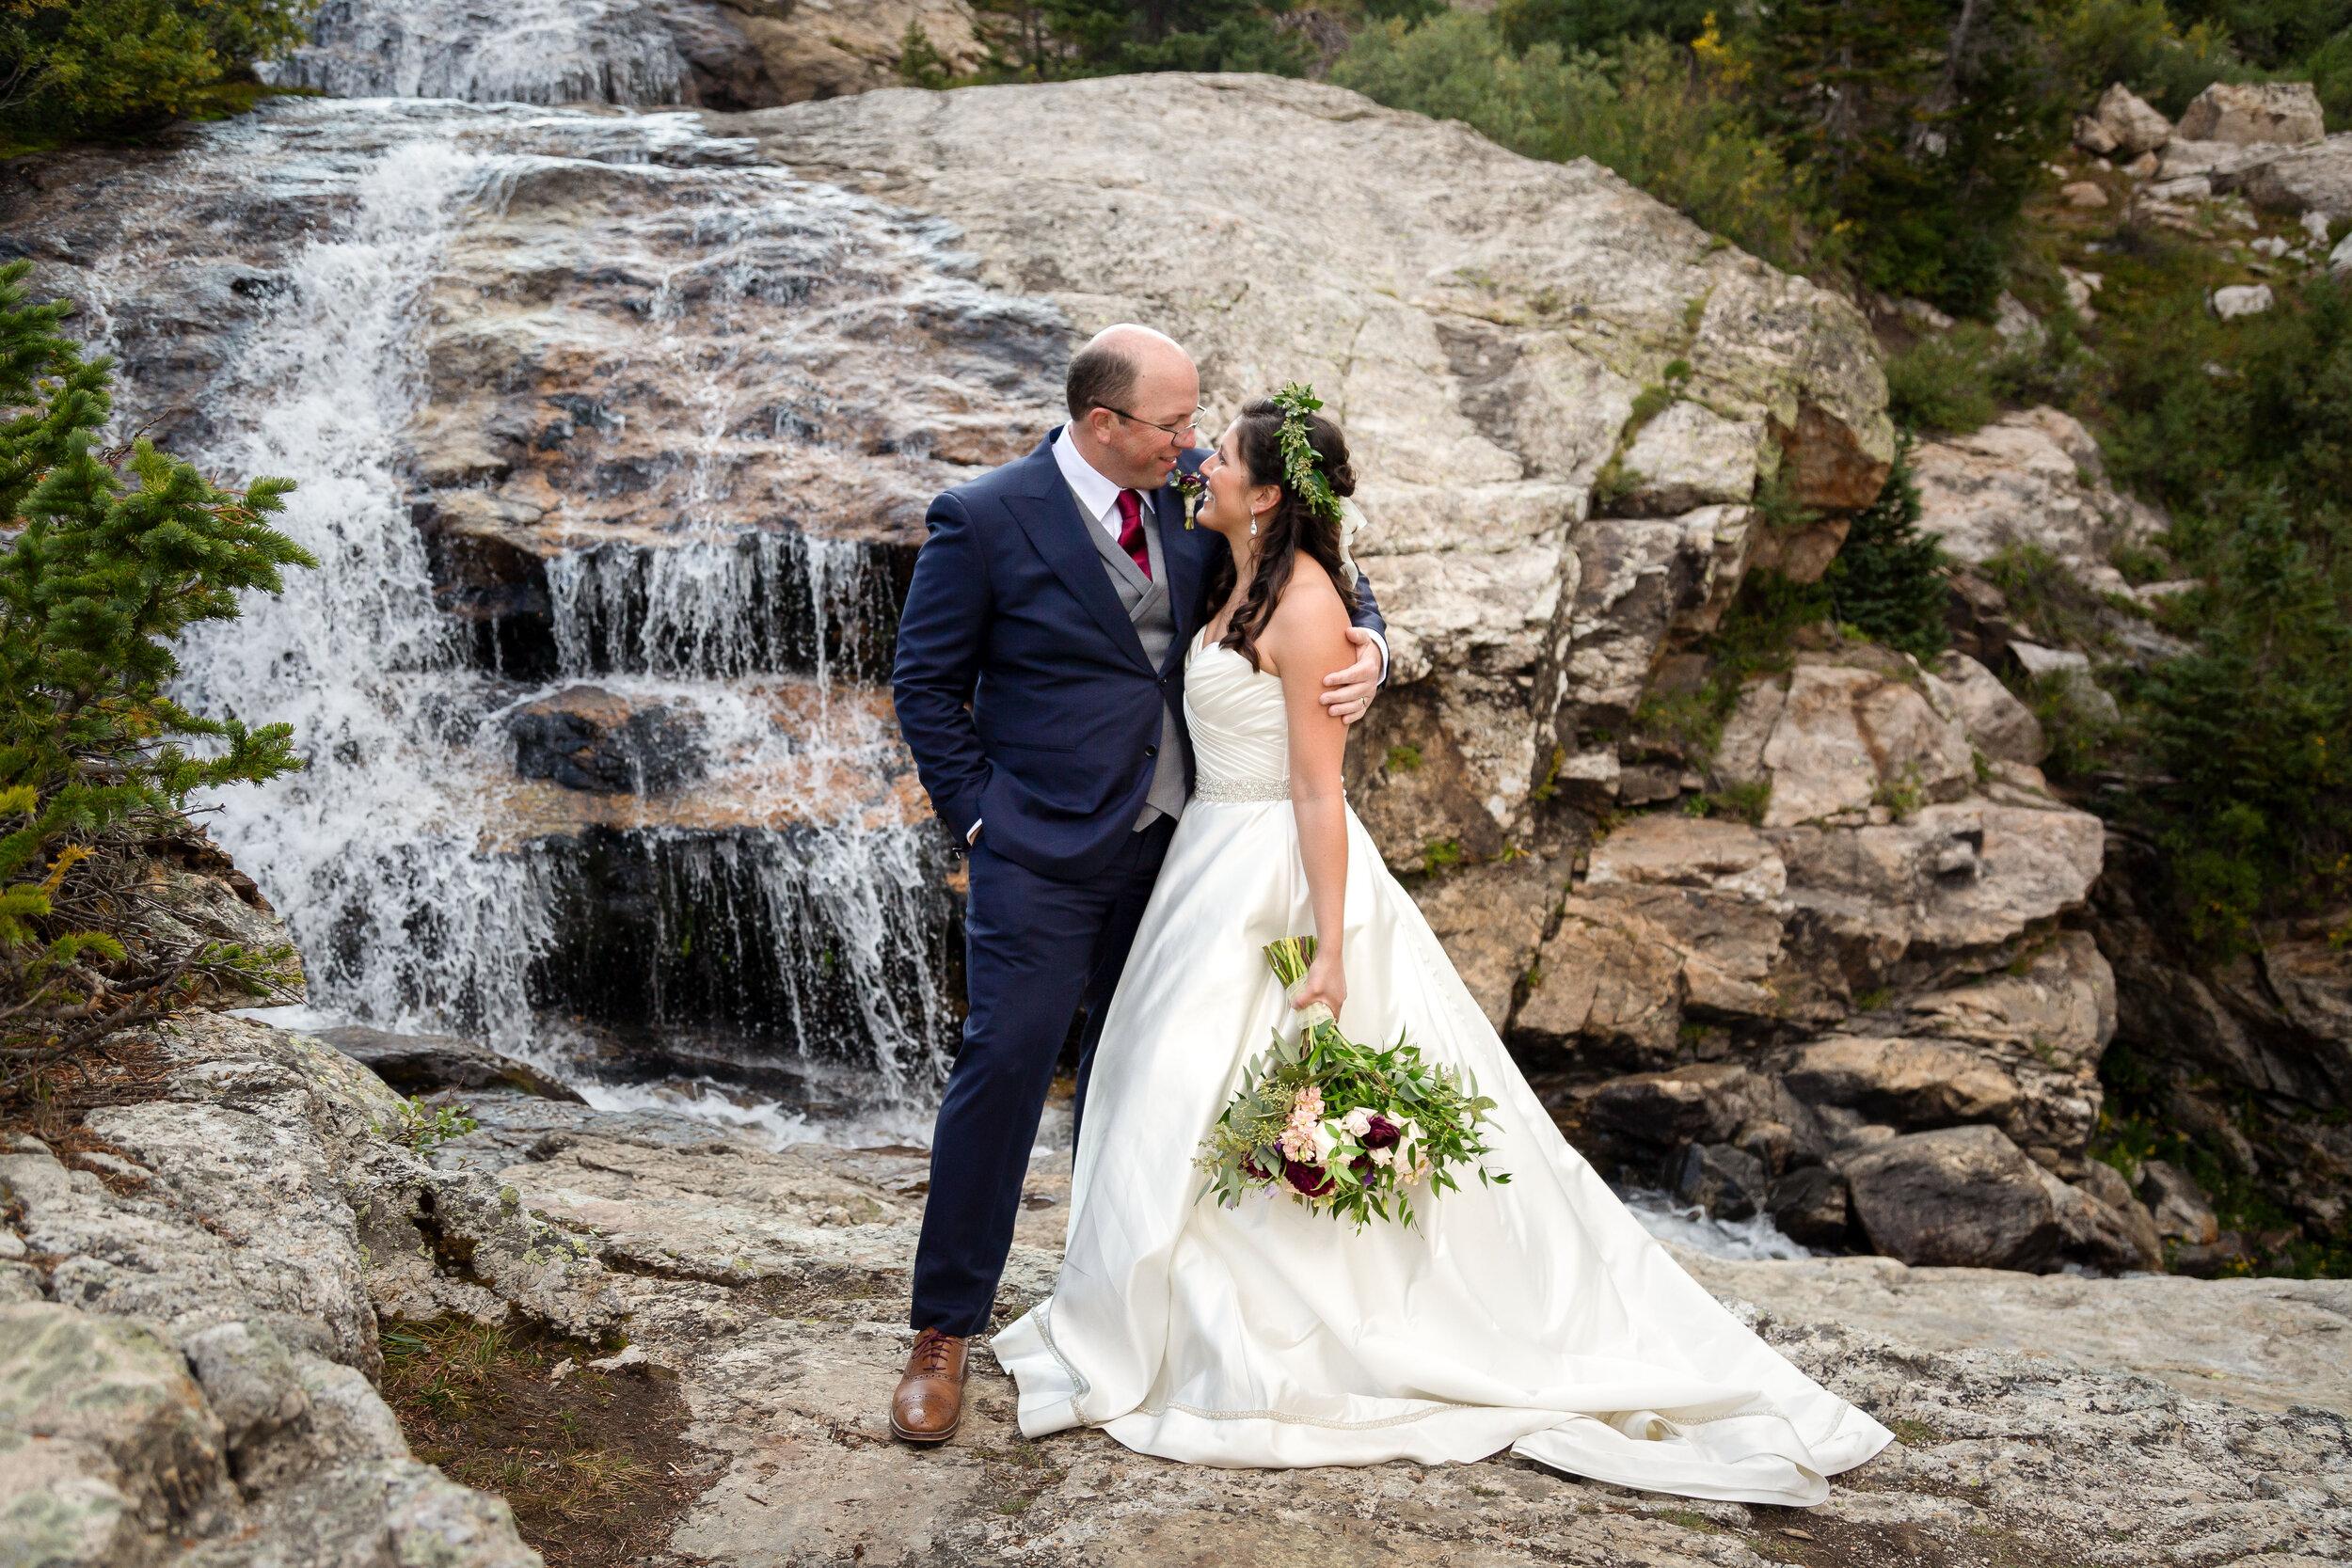 A Colorado Rocky Mountain Destination Wedding for Chris and Monica